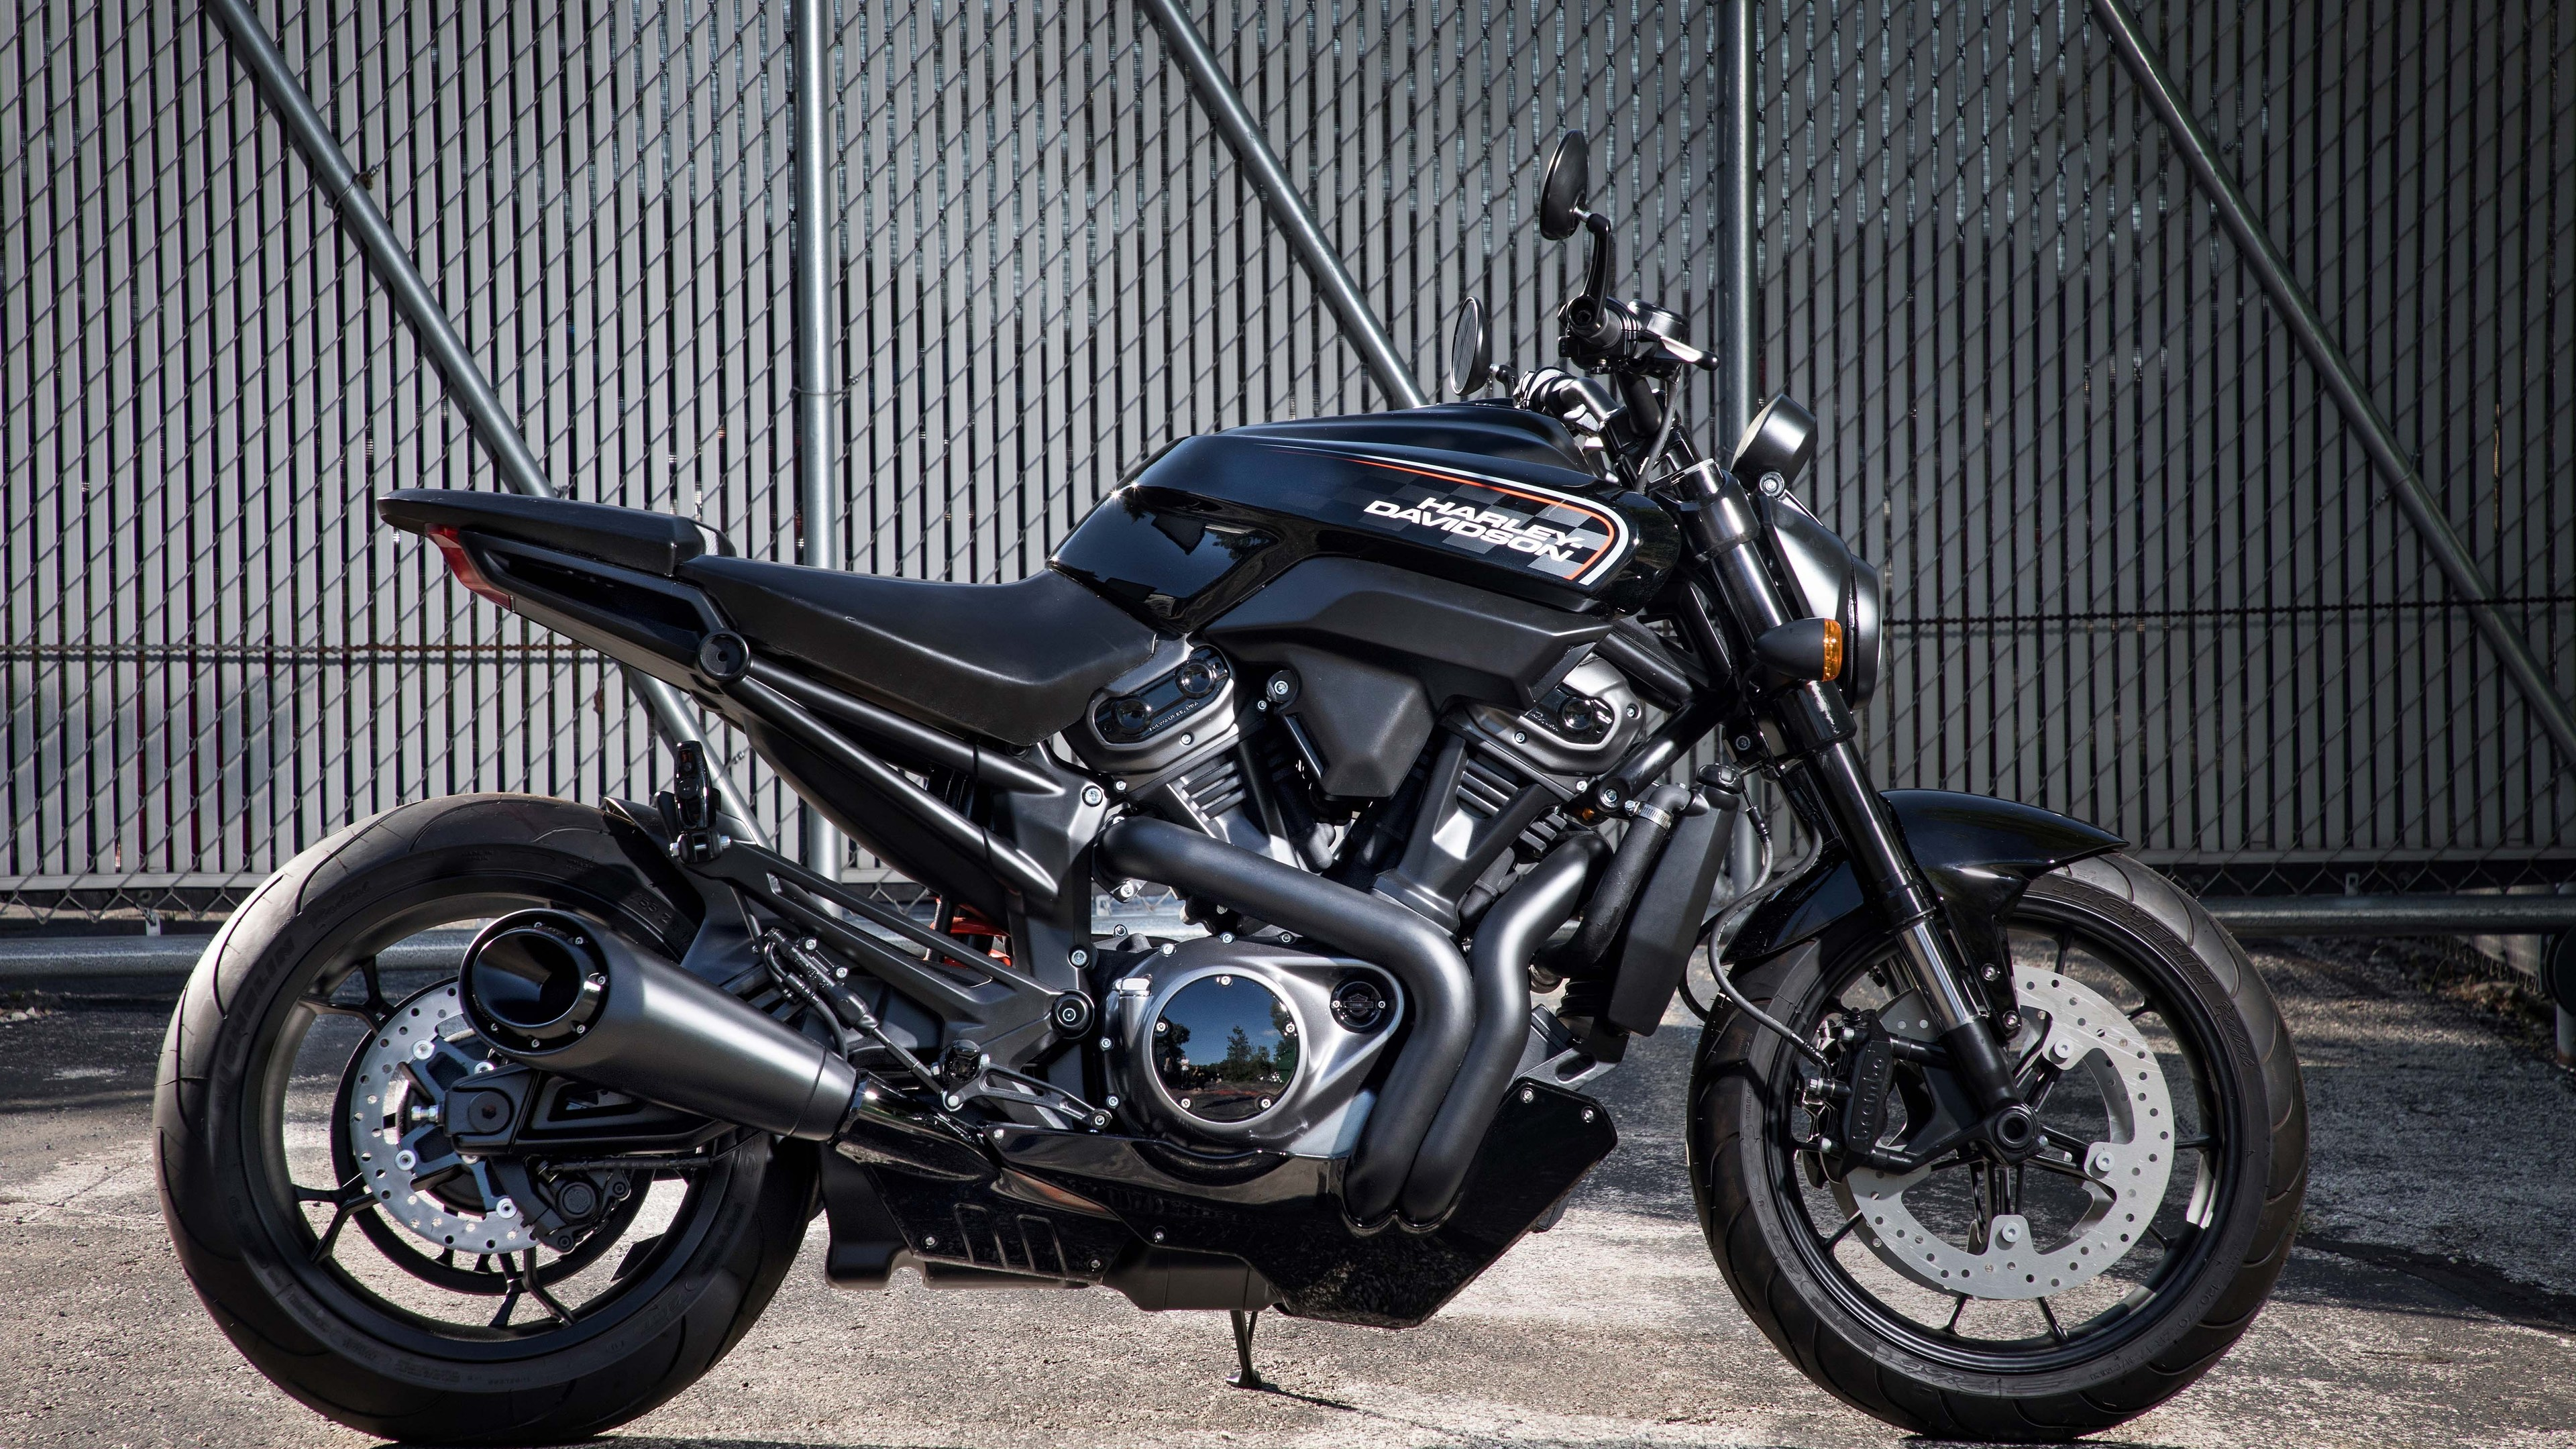 2020 harley davidson streetfighter 1538943428 - 2020 Harley Davidson Streetfighter - hd-wallpapers, harley davidson wallpapers, harley davidson streetfighter wallpapers, bikes wallpapers, 5k wallpapers, 4k-wallpapers, 2020 bikes wallpapers